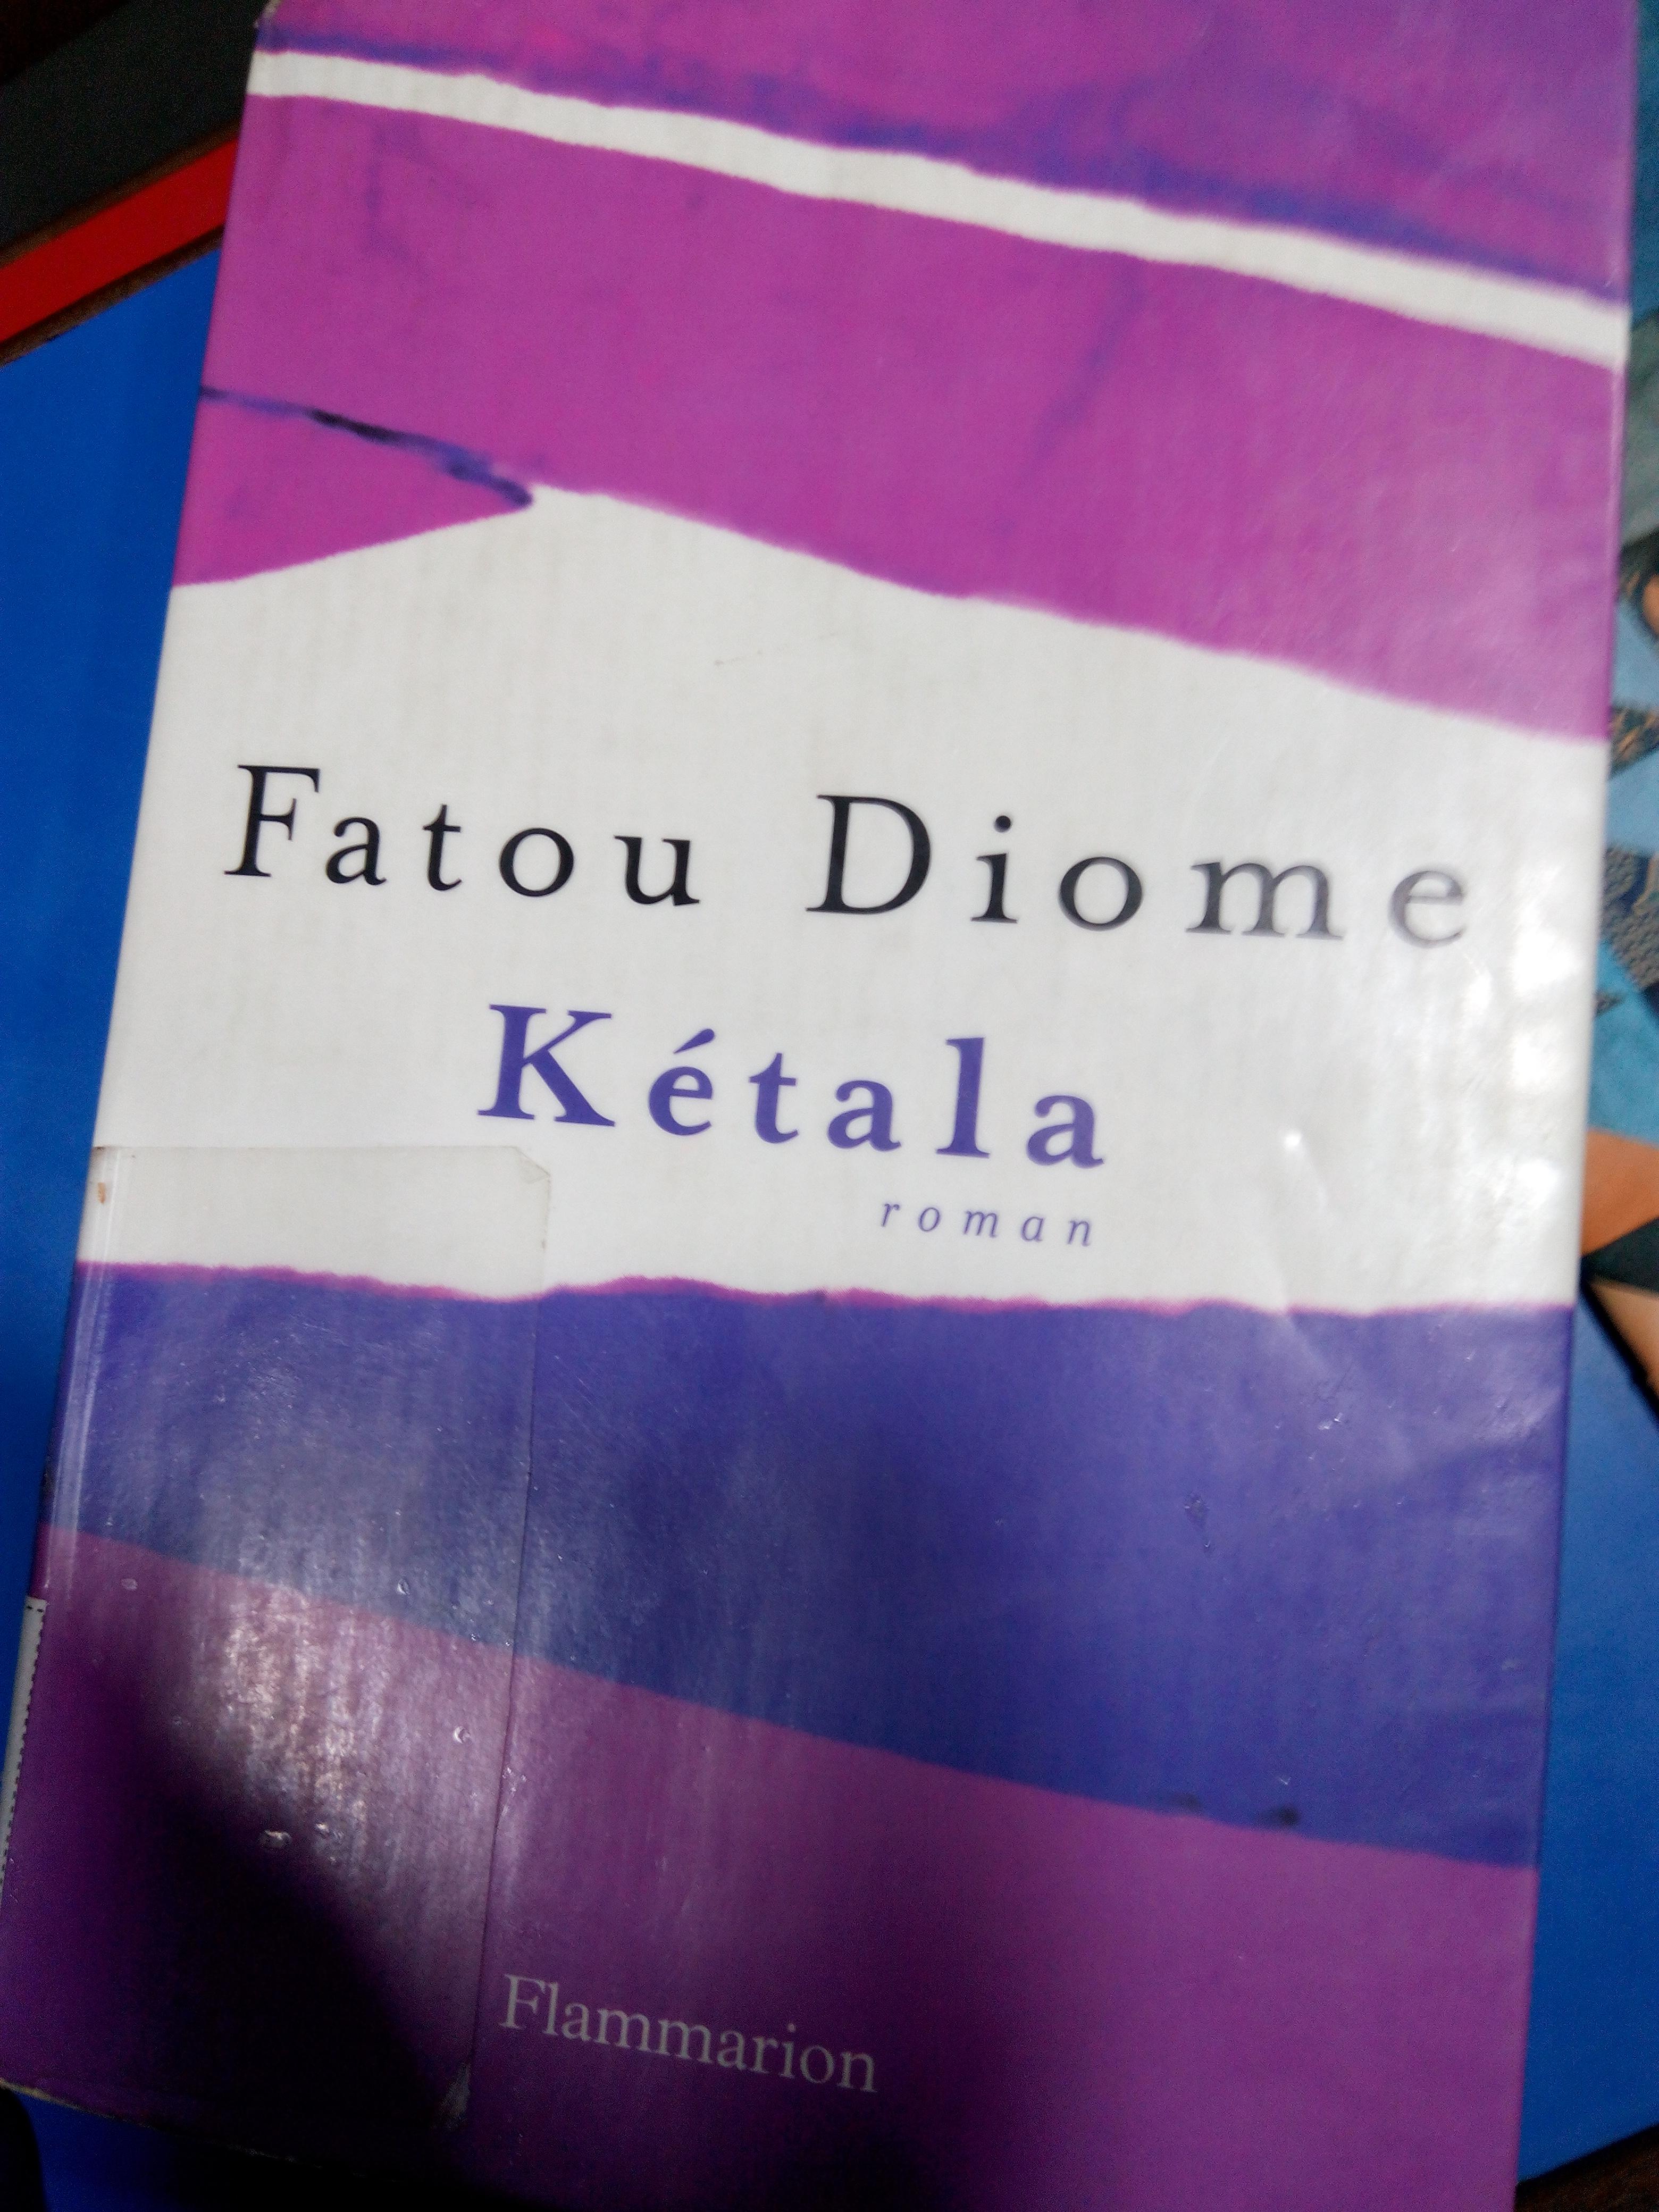 Ketala-Fatou-Diome